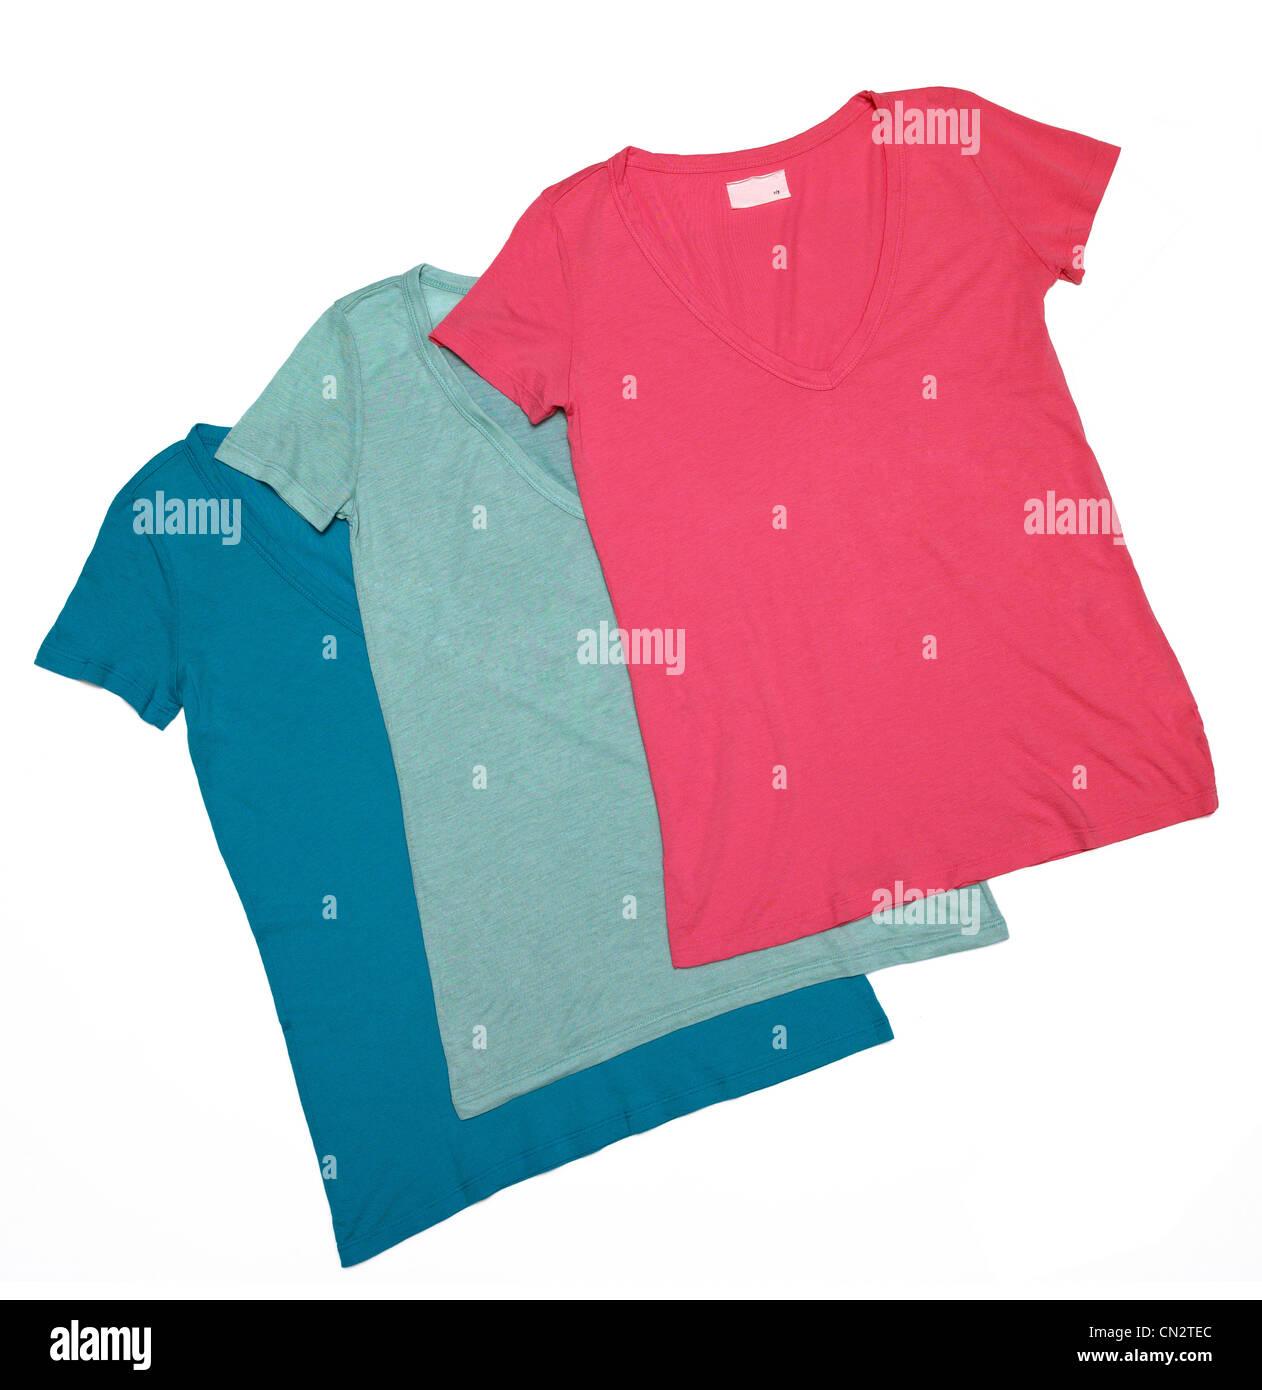 Three Female Tee Shirts - Stock Image